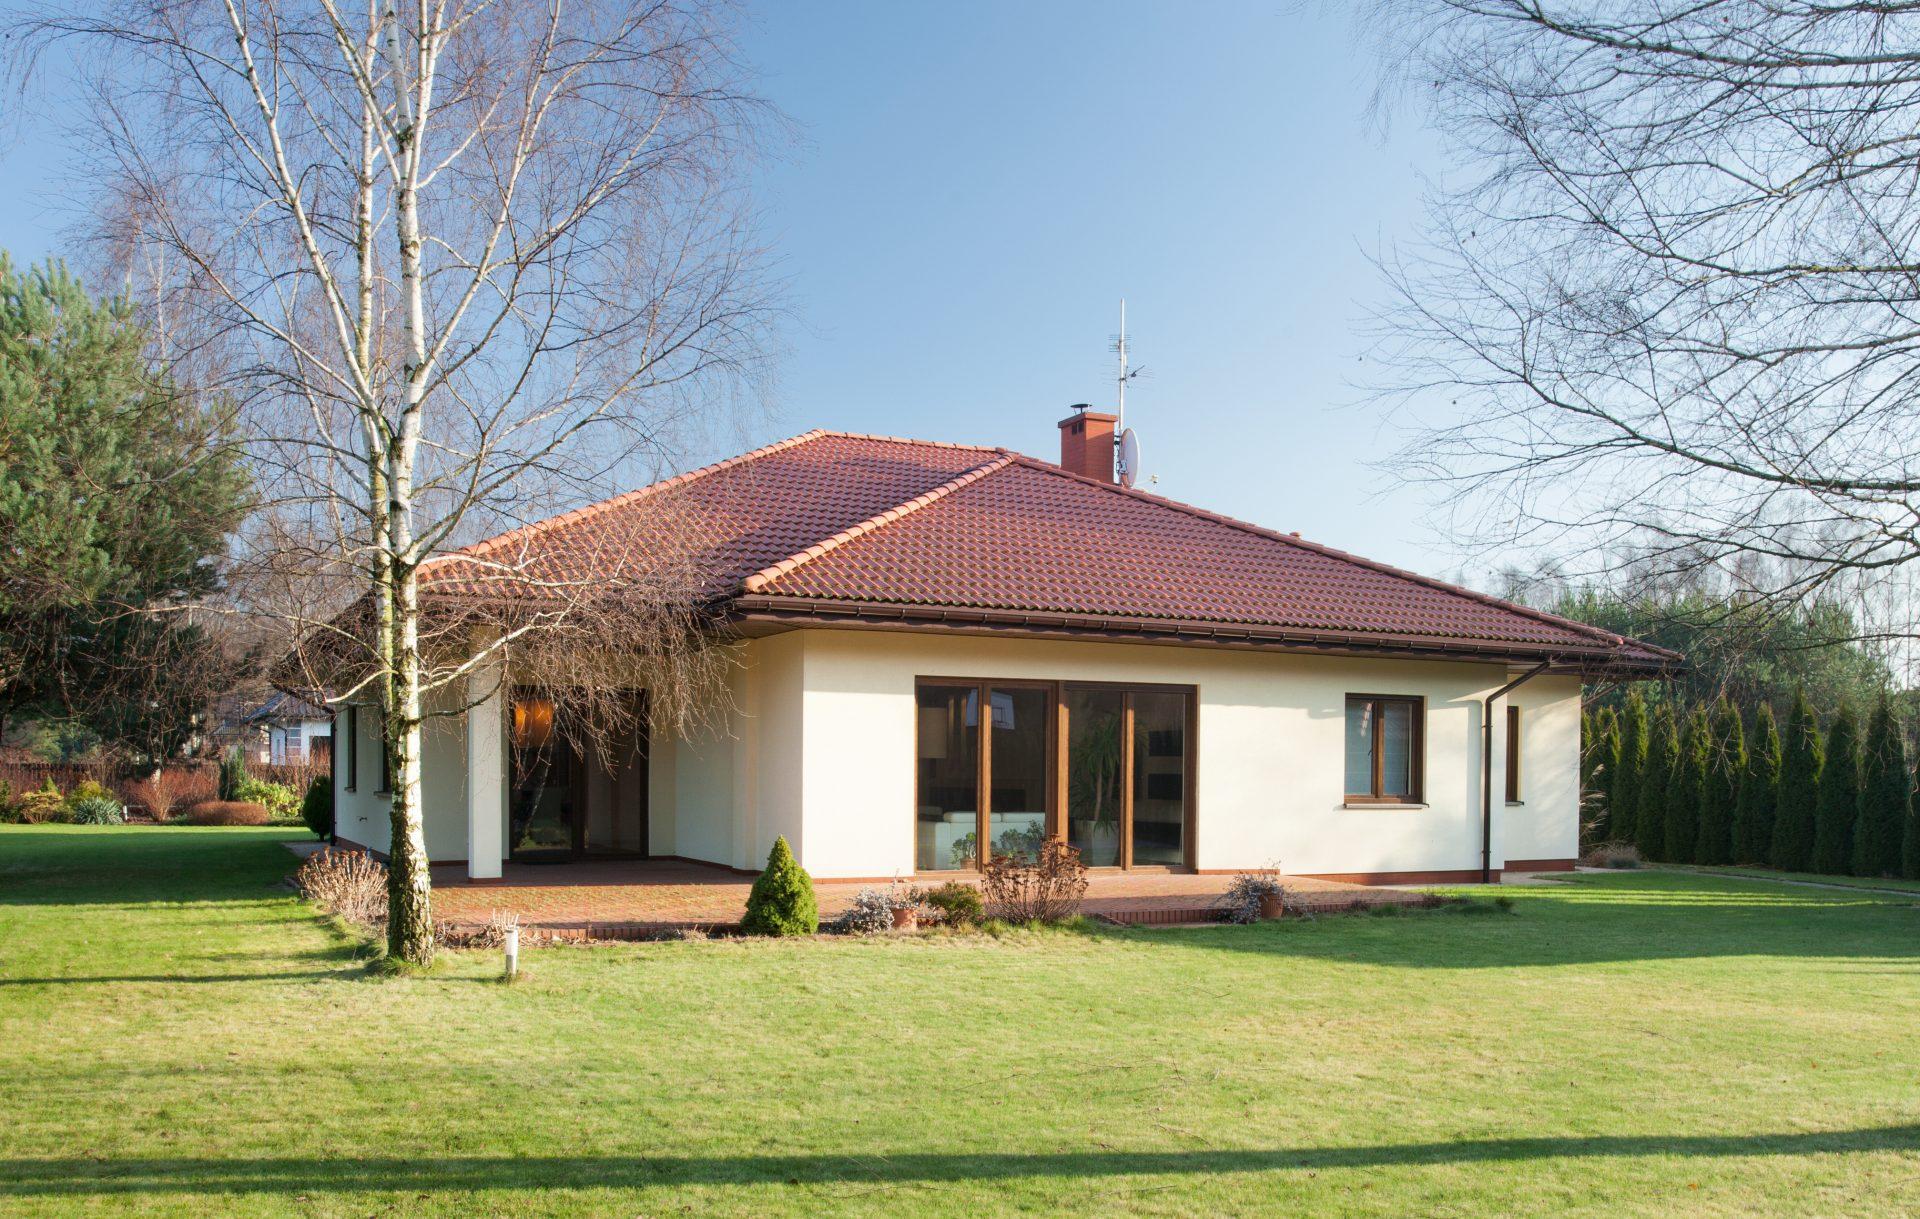 Zateplenie stropu v bungalove